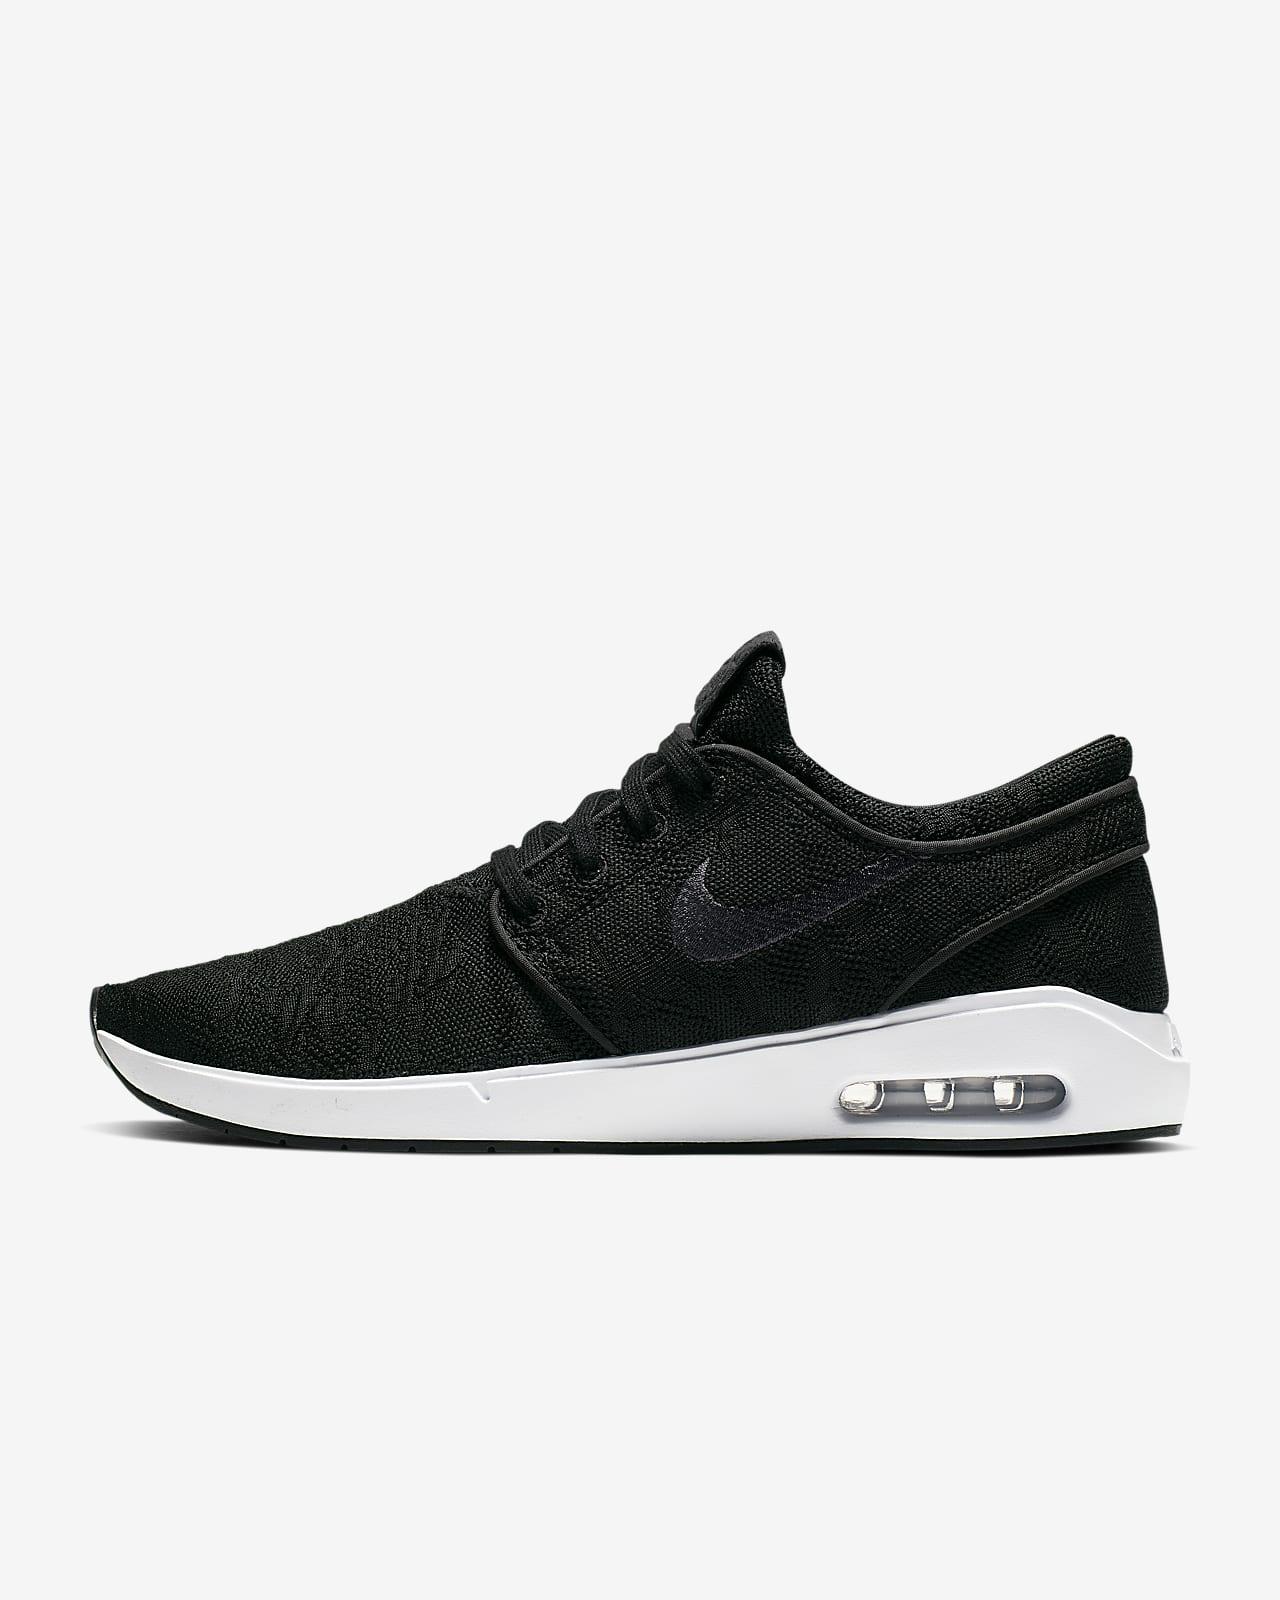 Calzado de skateboarding Nike SB Air Max Stefan Janoski 2